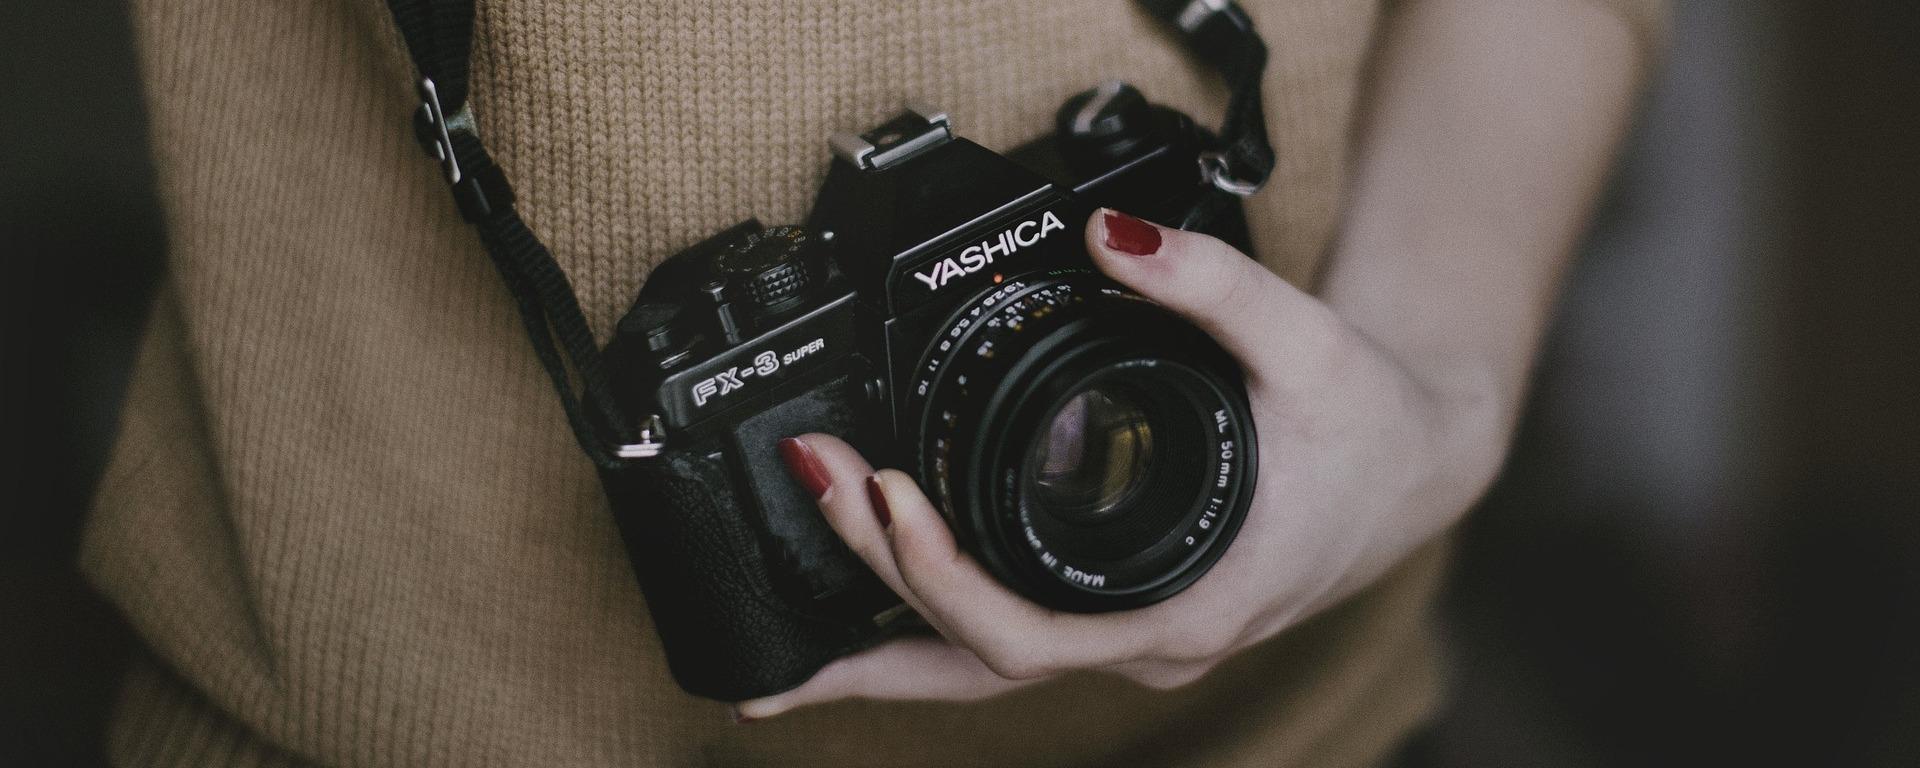 woman camera photo photography